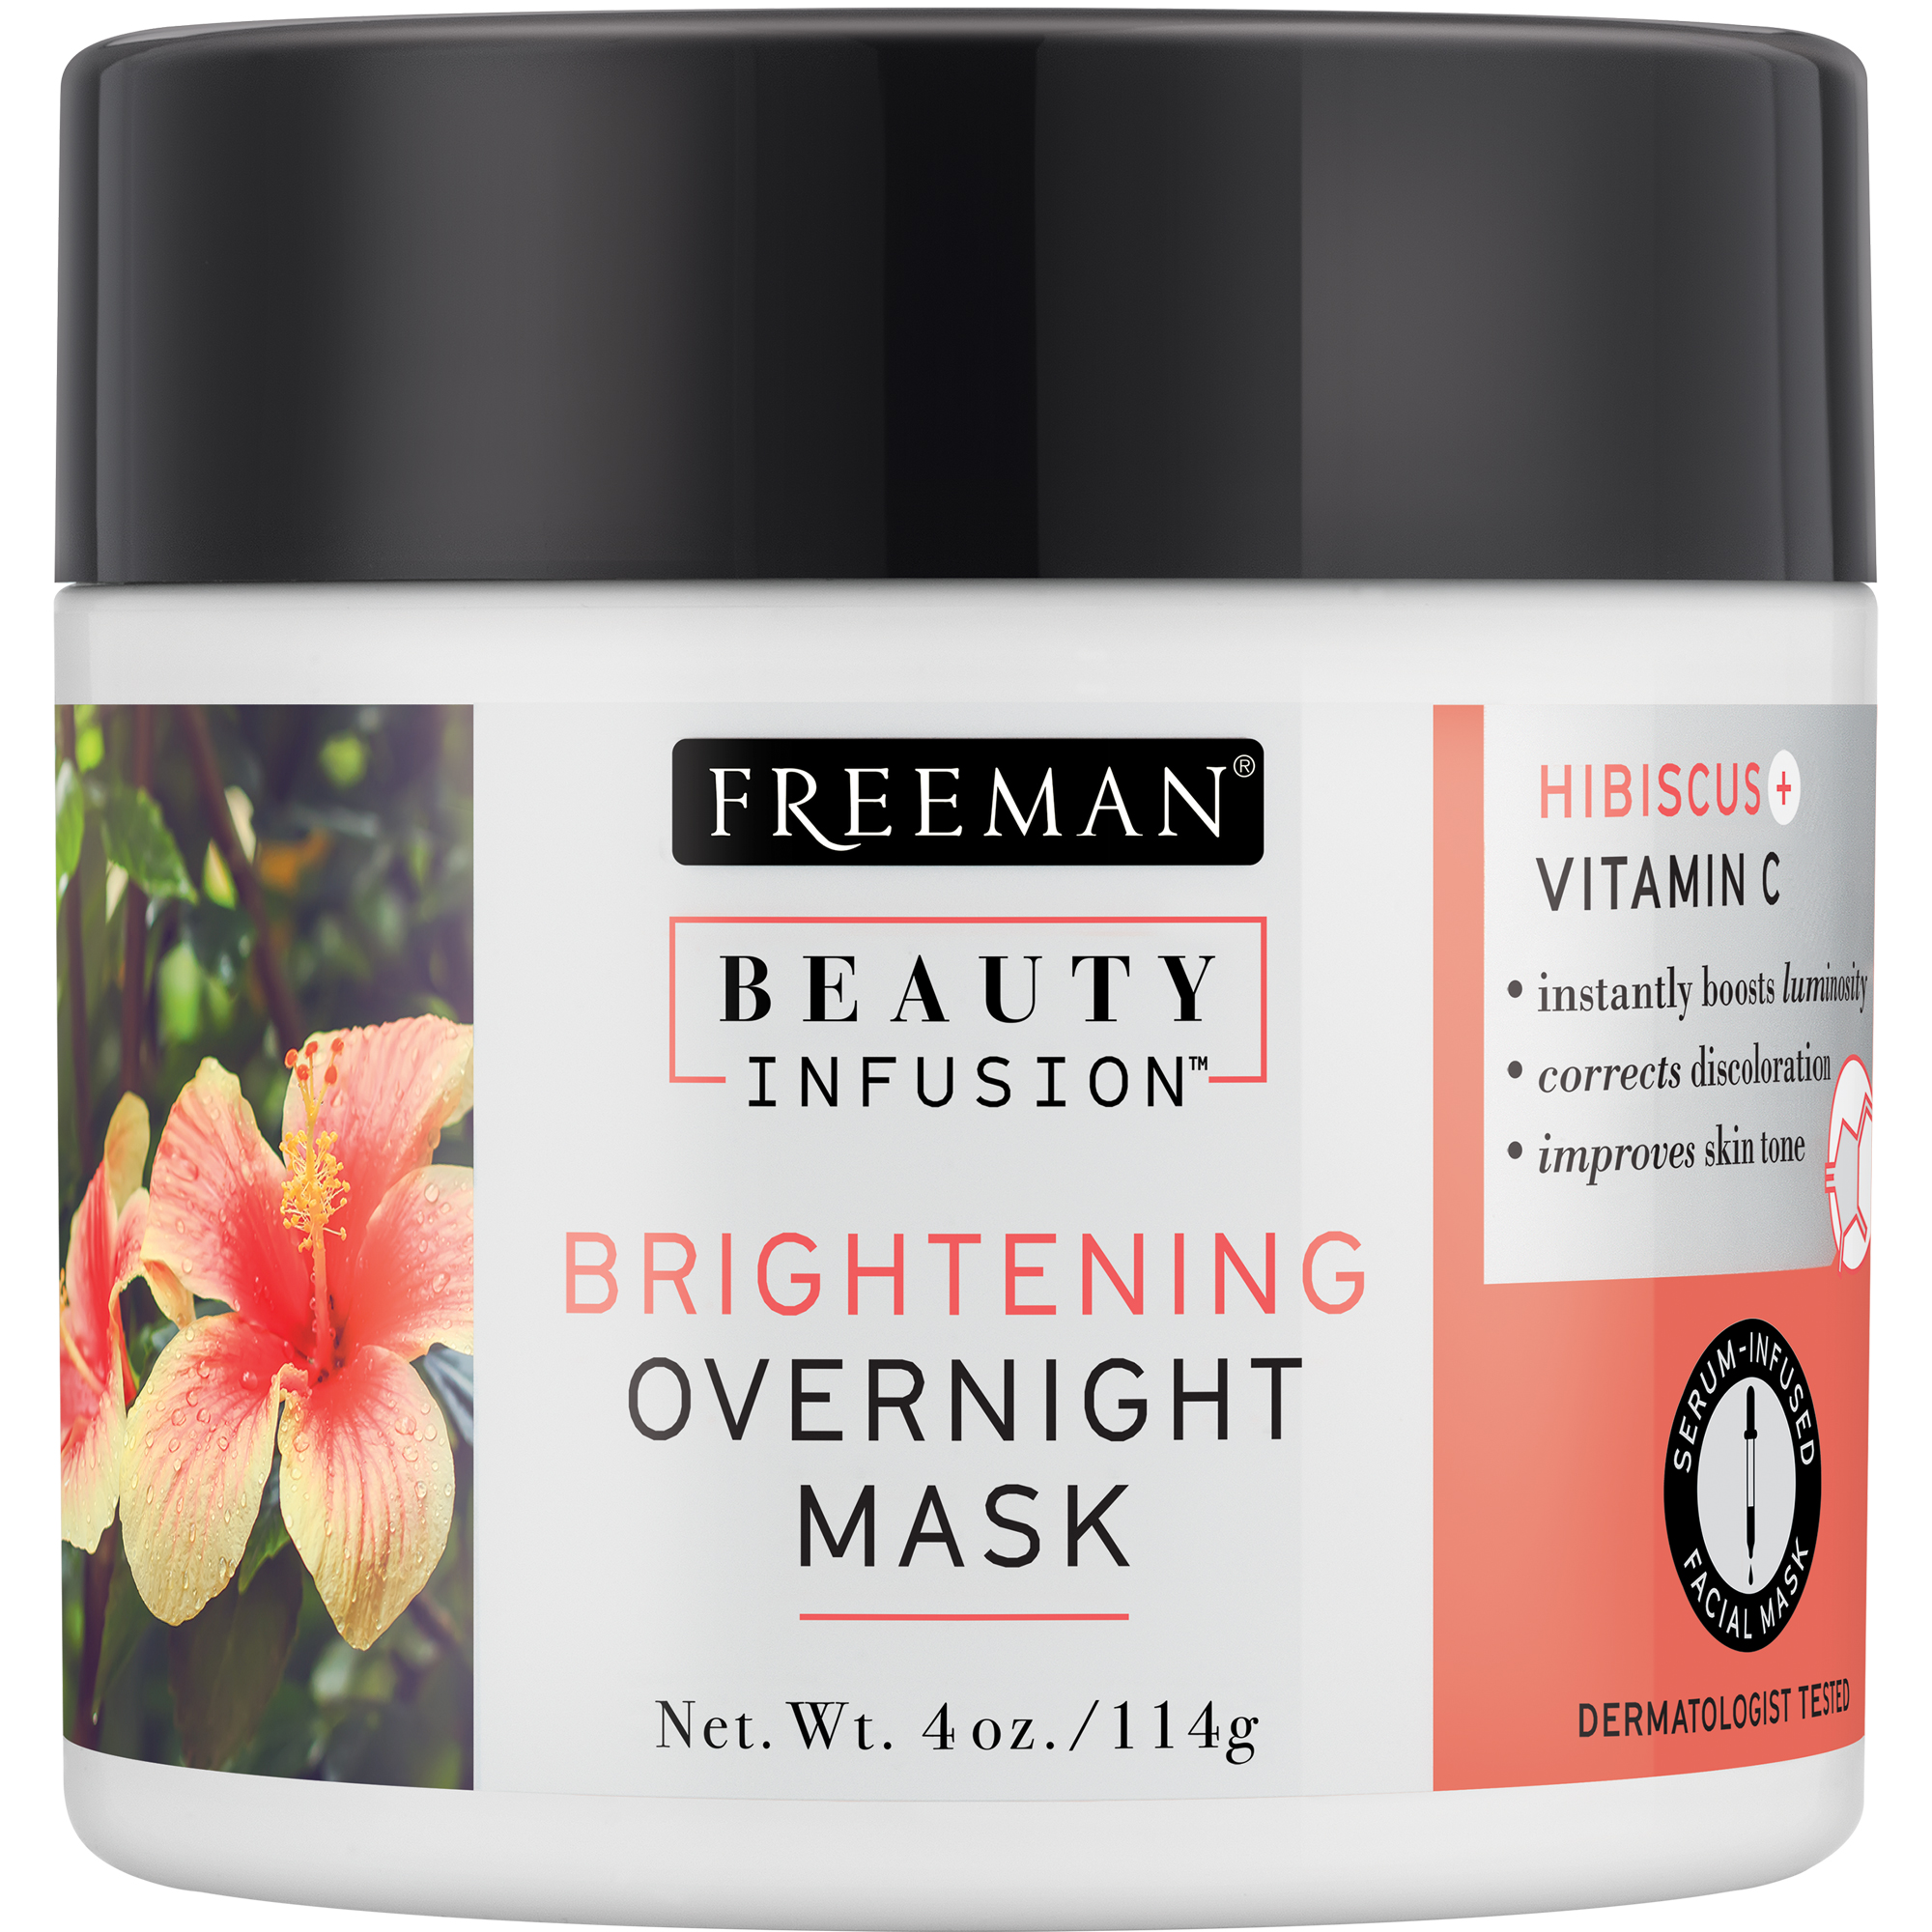 Brightening Overnight Face Mask Hibiscus Vitamin C Walmart